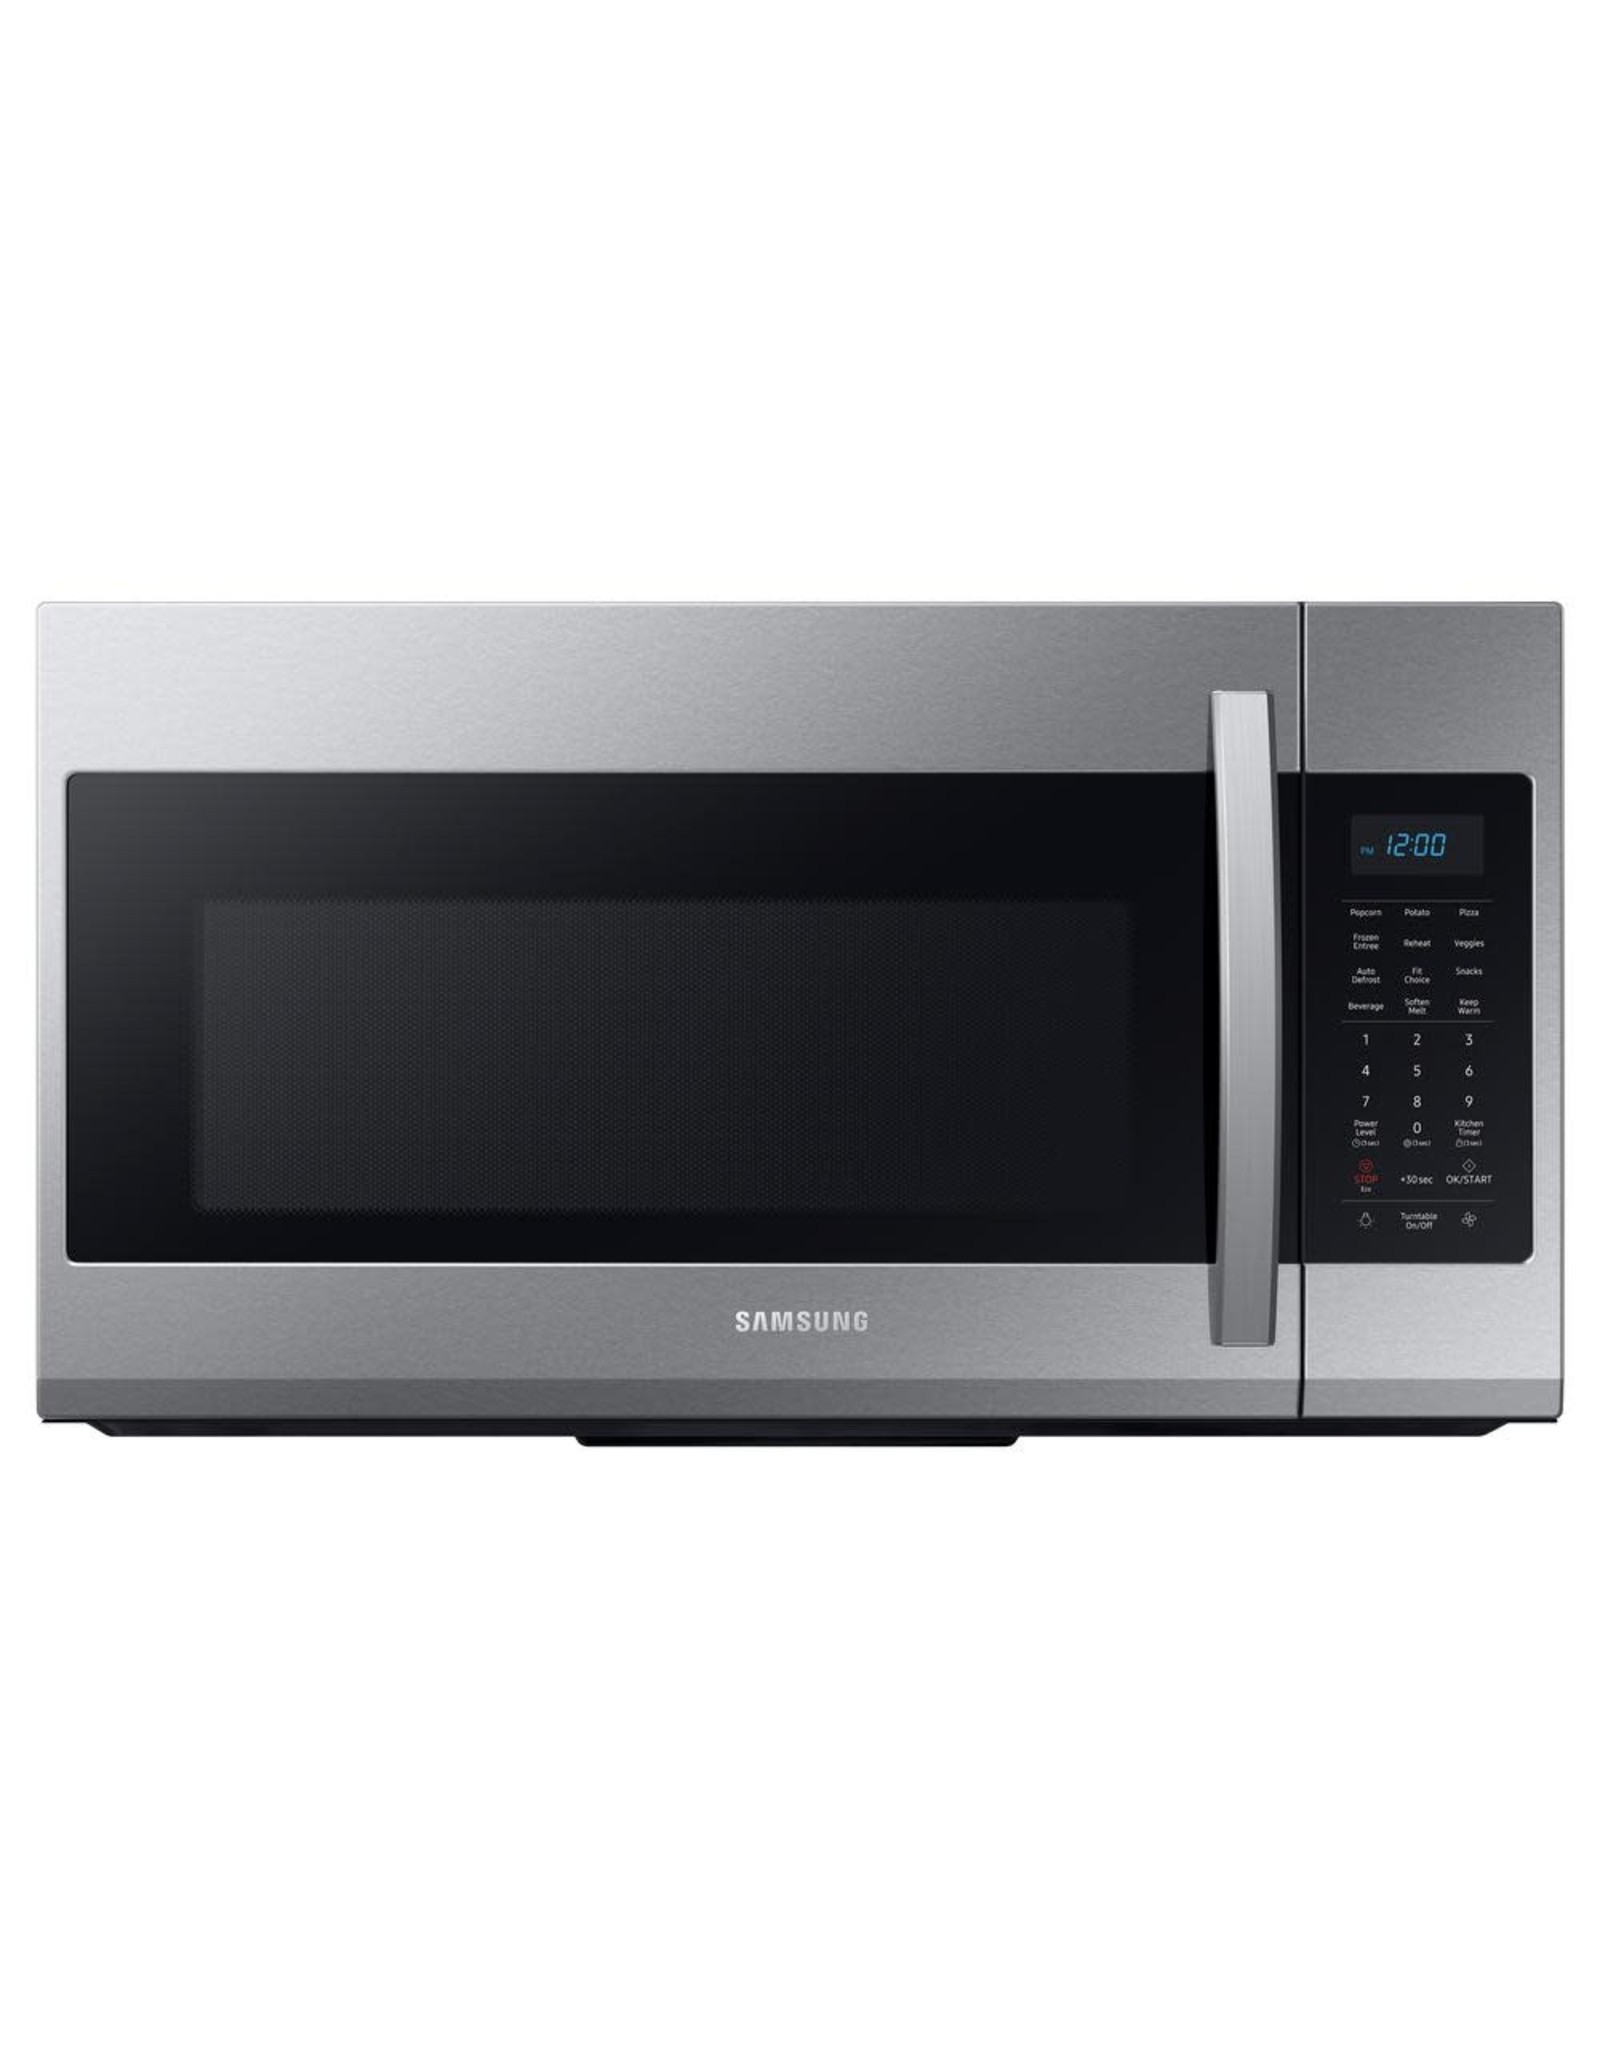 SAMSUNG ME19R7041FS Samsung 30 in. 1.9 cu. ft. Over-the-Range Microwave in Fingerprint Resistant Stainless Steel